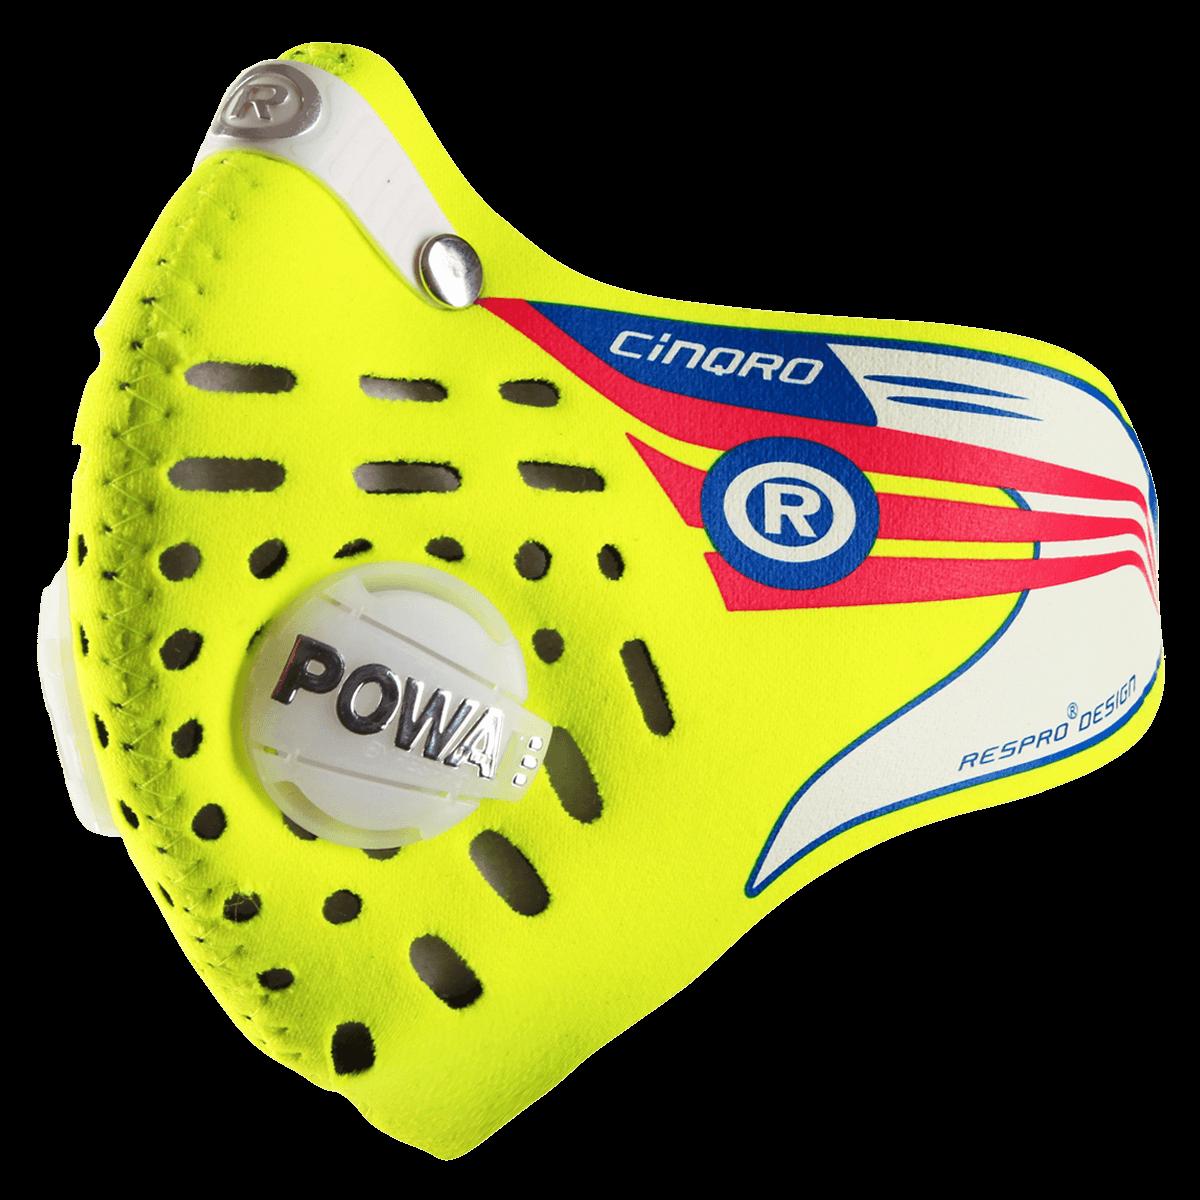 Maska antysmogowa Respro CINQRO MASK yellow fluo